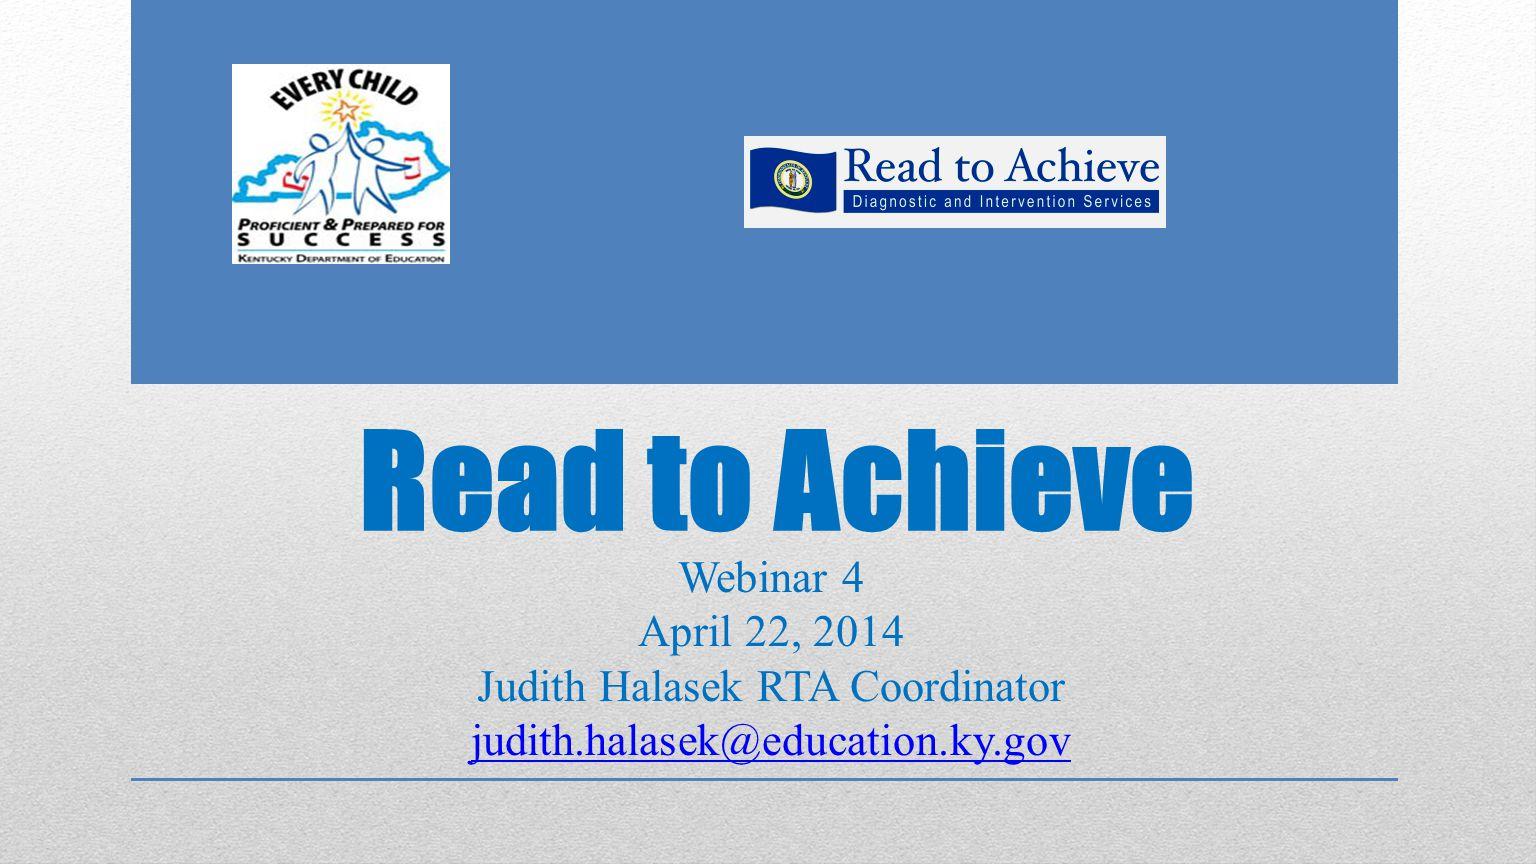 Read to Achieve Webinar 4 April 22, 2014 Judith Halasek RTA Coordinator judith.halasek@education.ky.gov